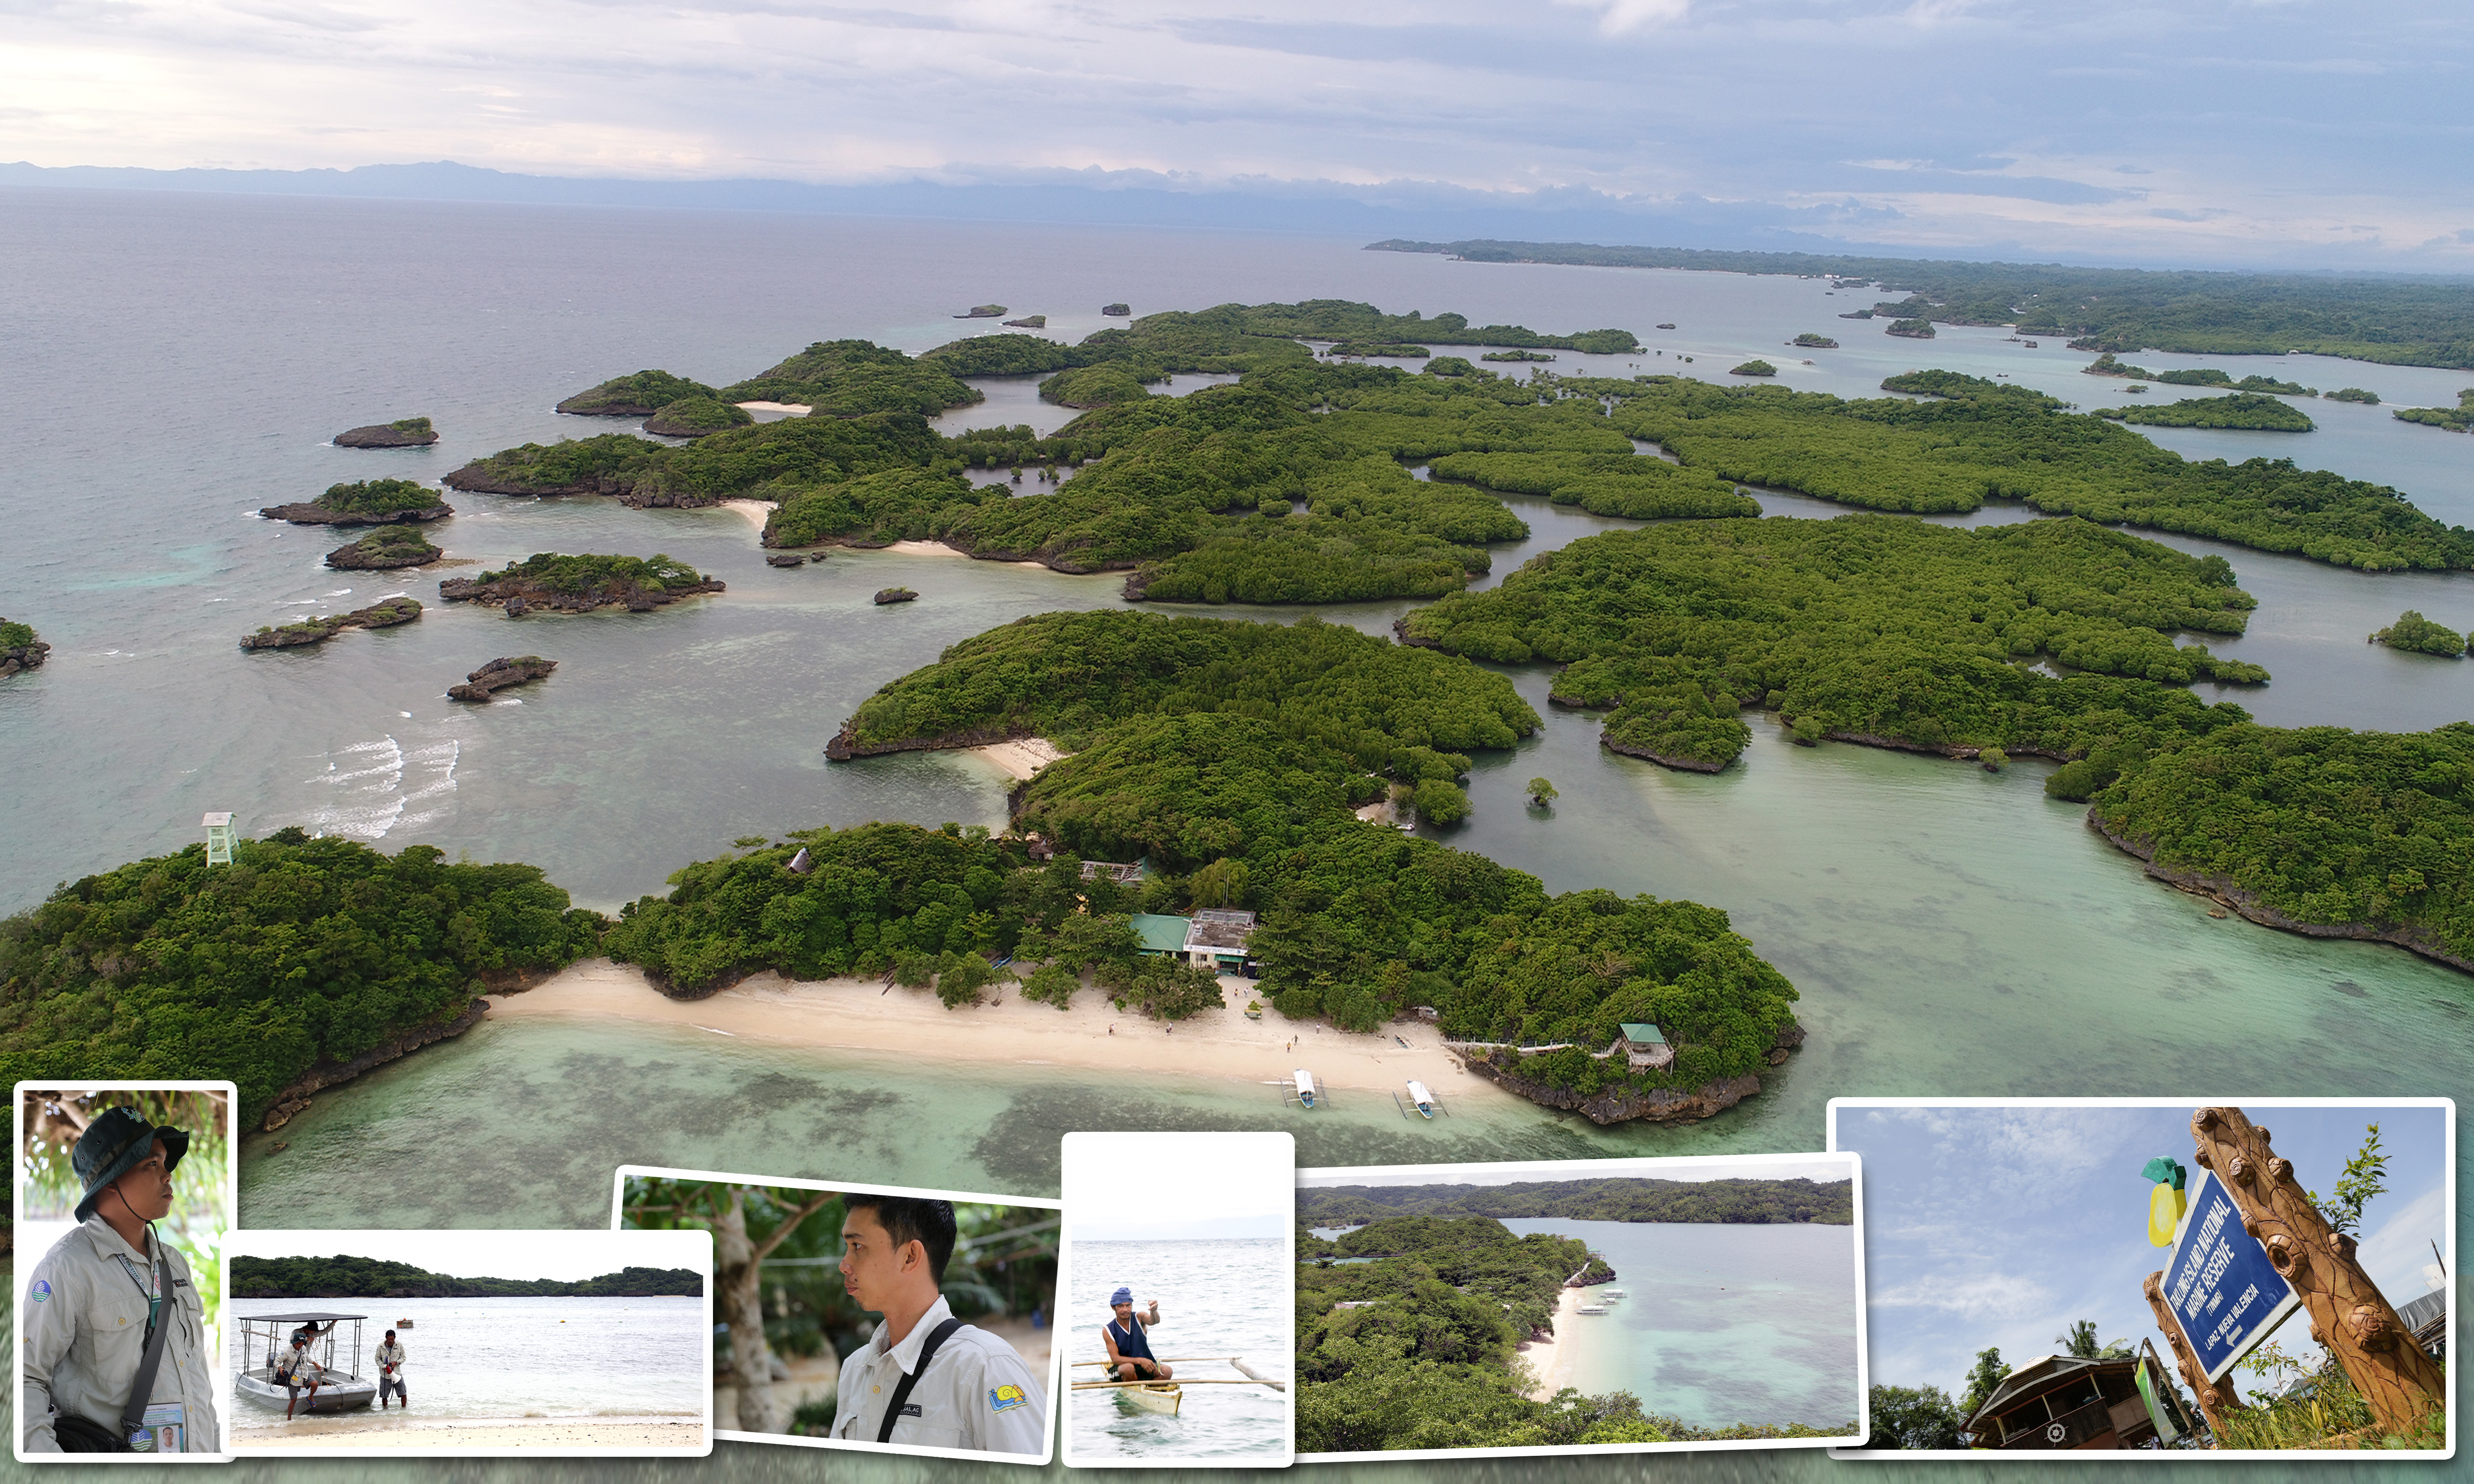 Taklong Island NMR: 'Jewel of Guimaras'